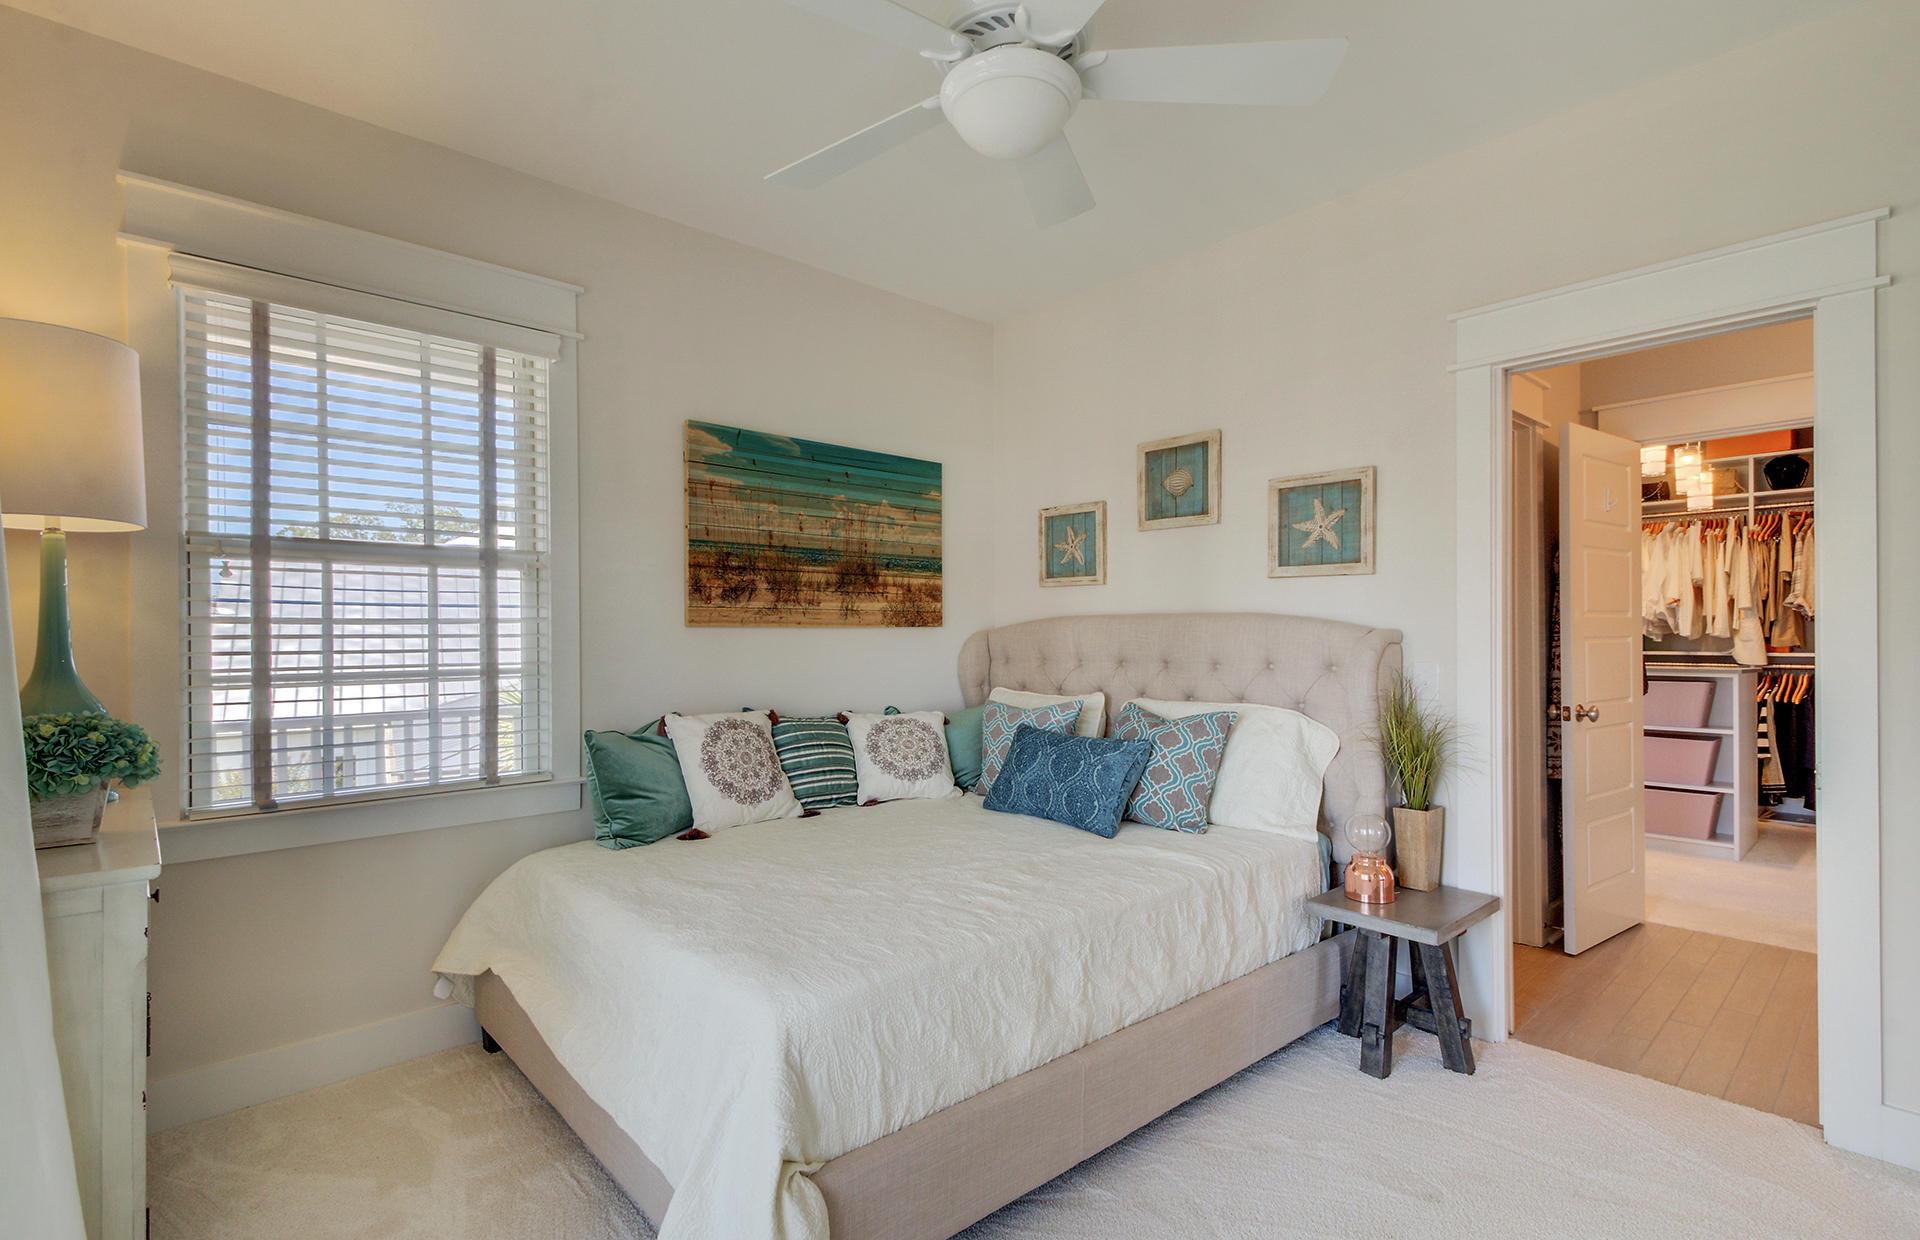 Daniel Island Homes For Sale - 135 Brailsford, Charleston, SC - 10